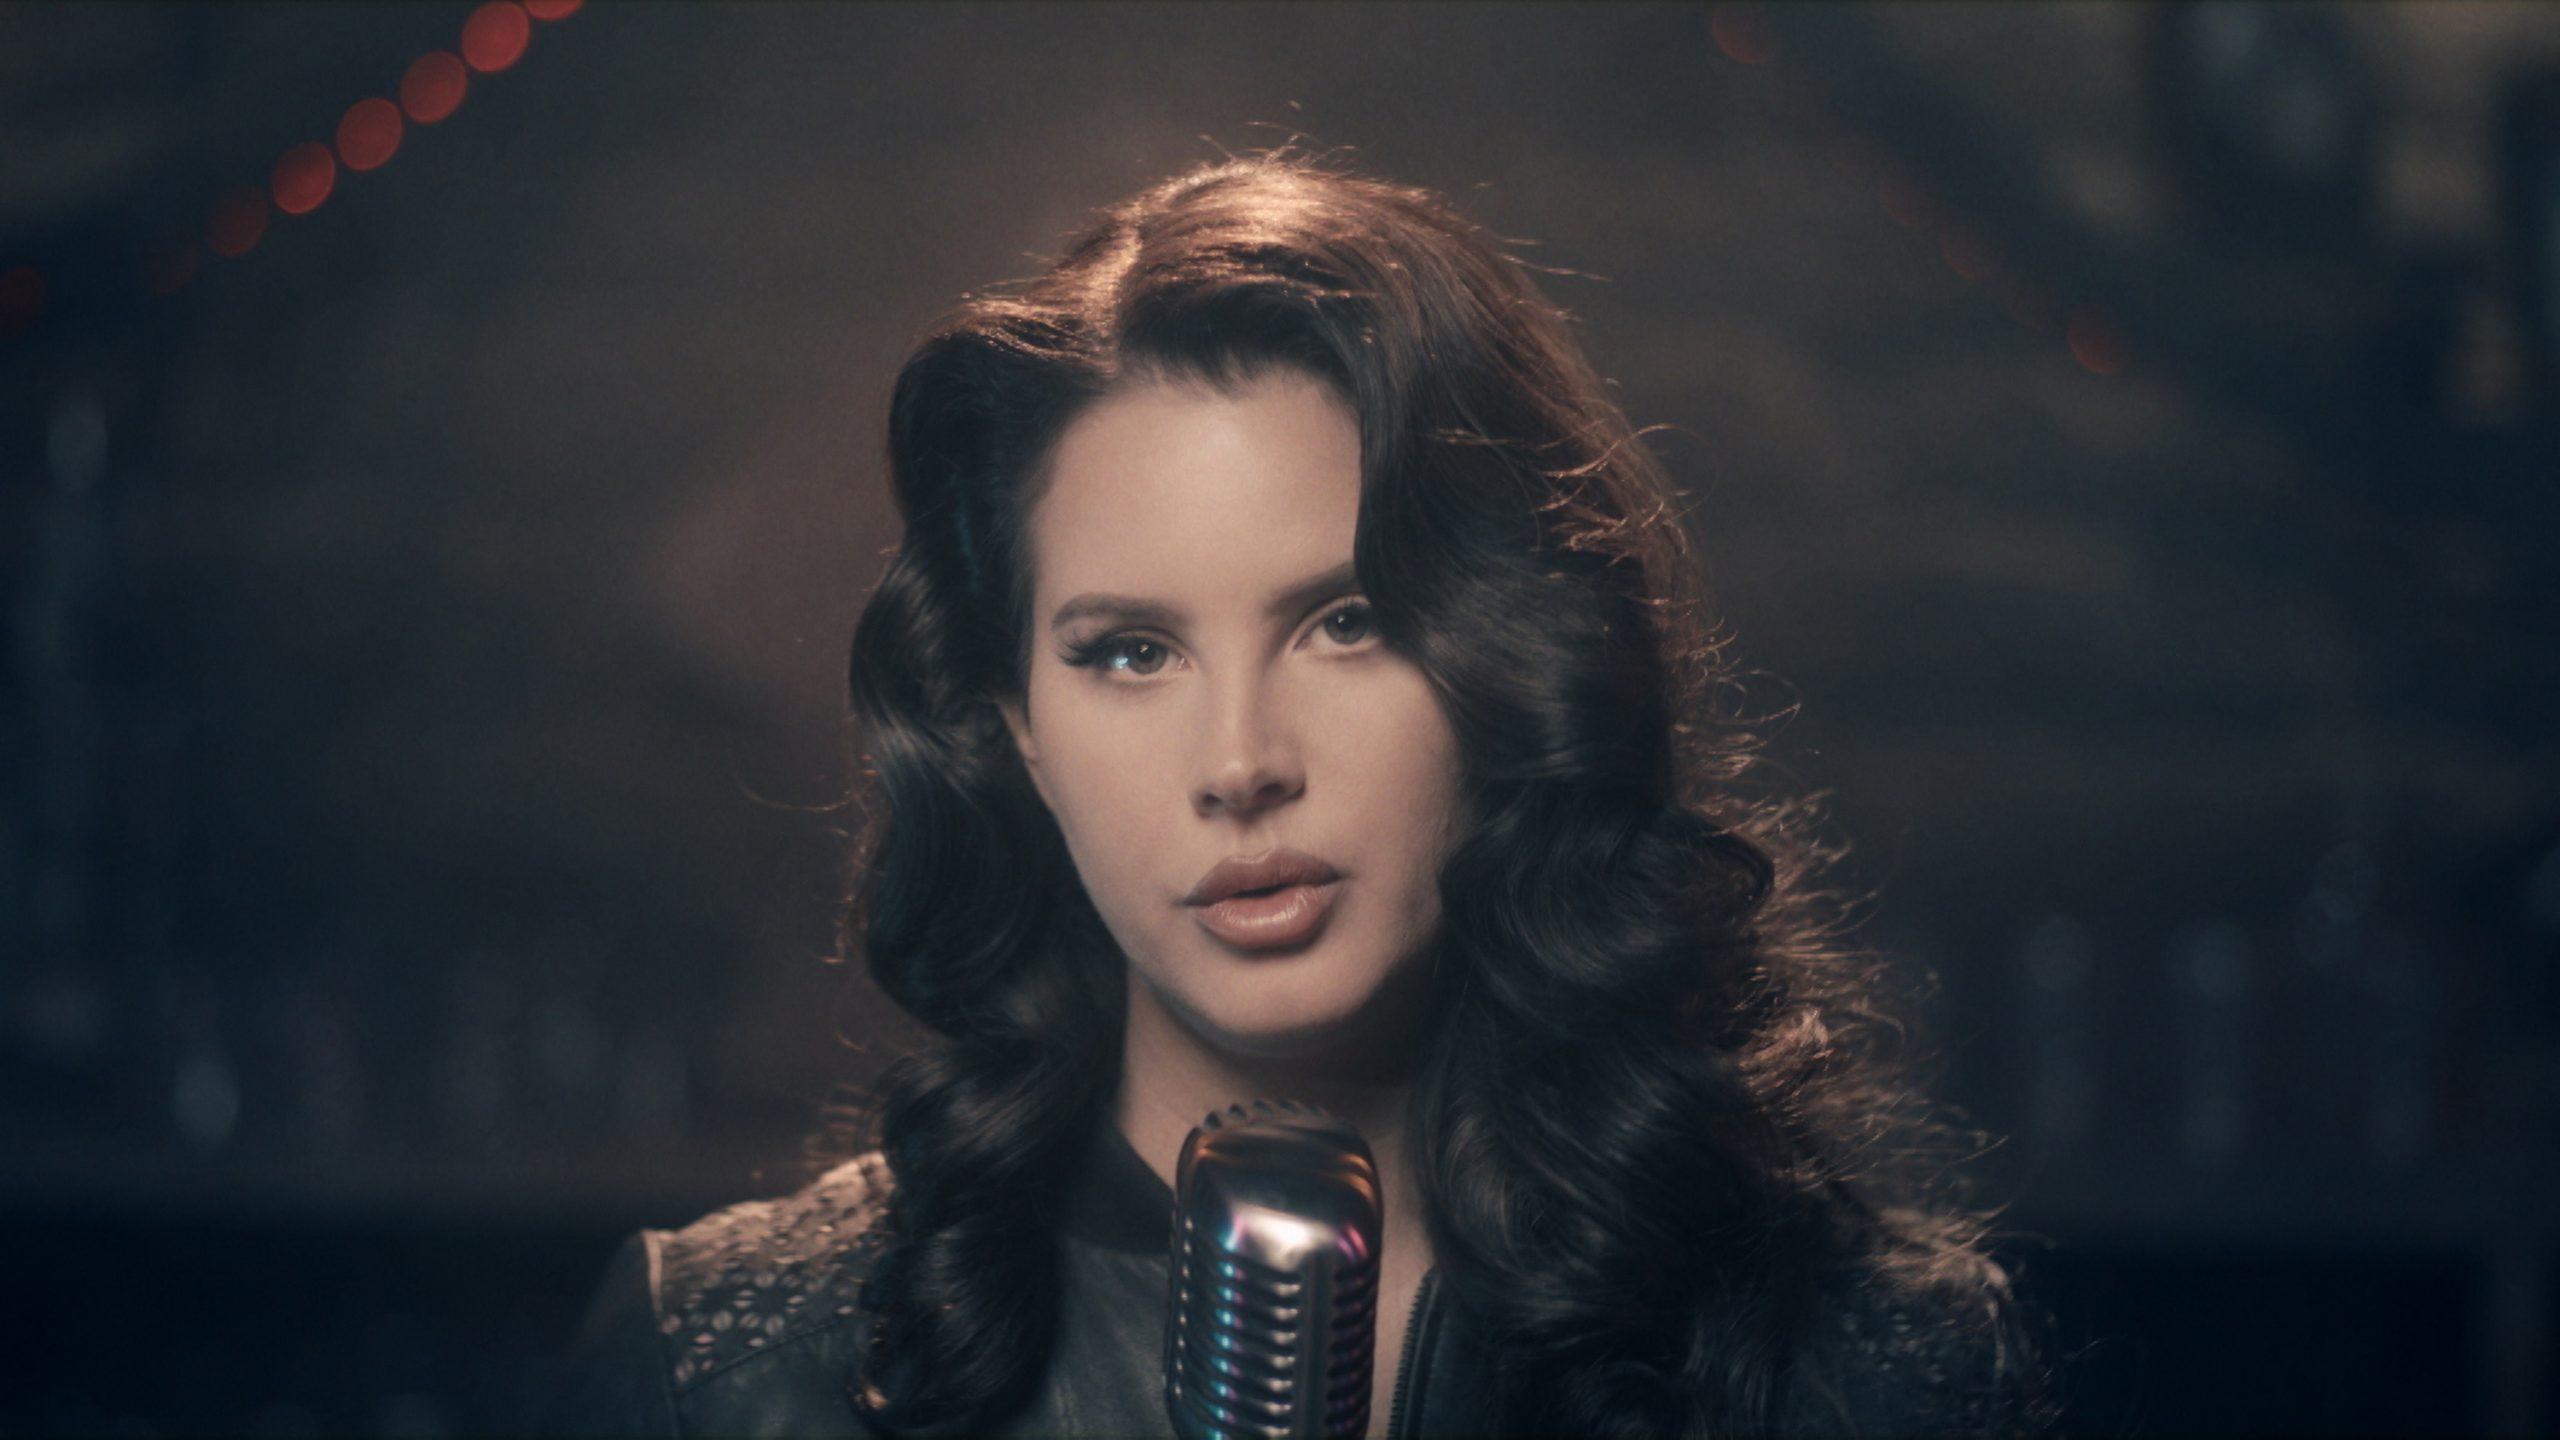 Lana Del Rey Clarifies Comments On Trump And Capitol Riot